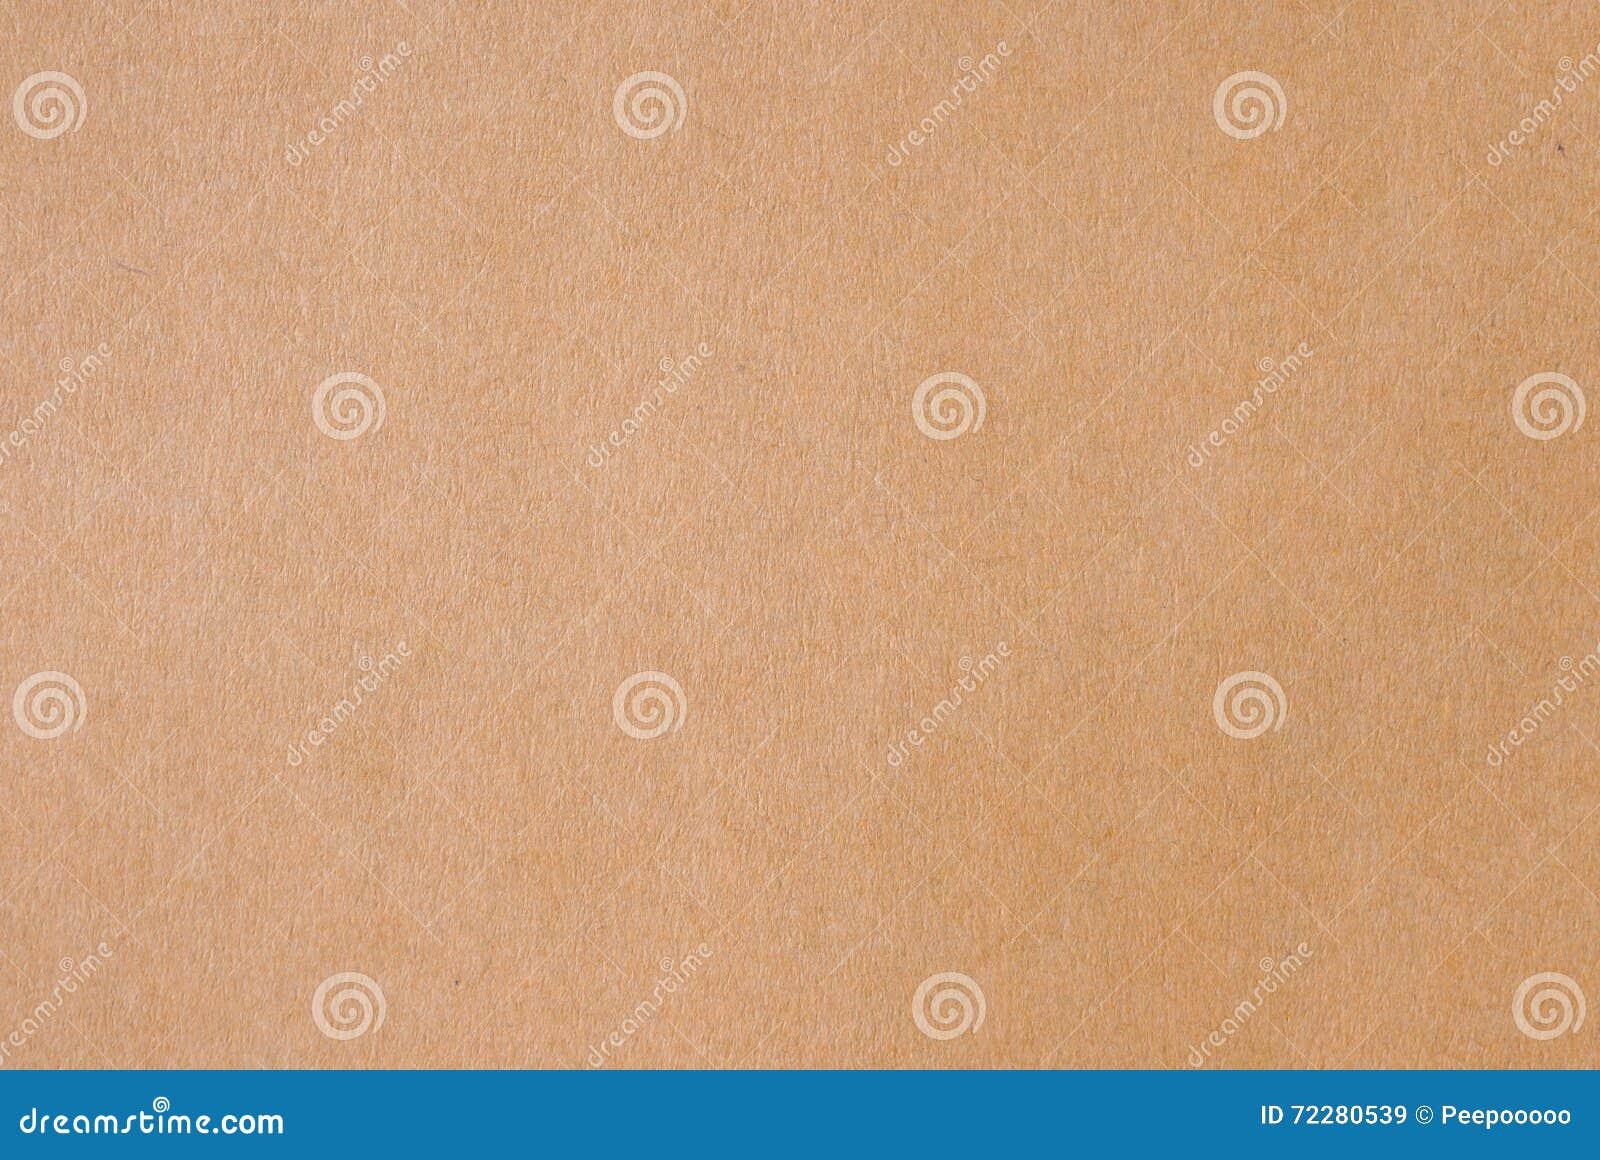 Download Предпосылка бумаги Брайна стоковое изображение. изображение насчитывающей конструкция - 72280539